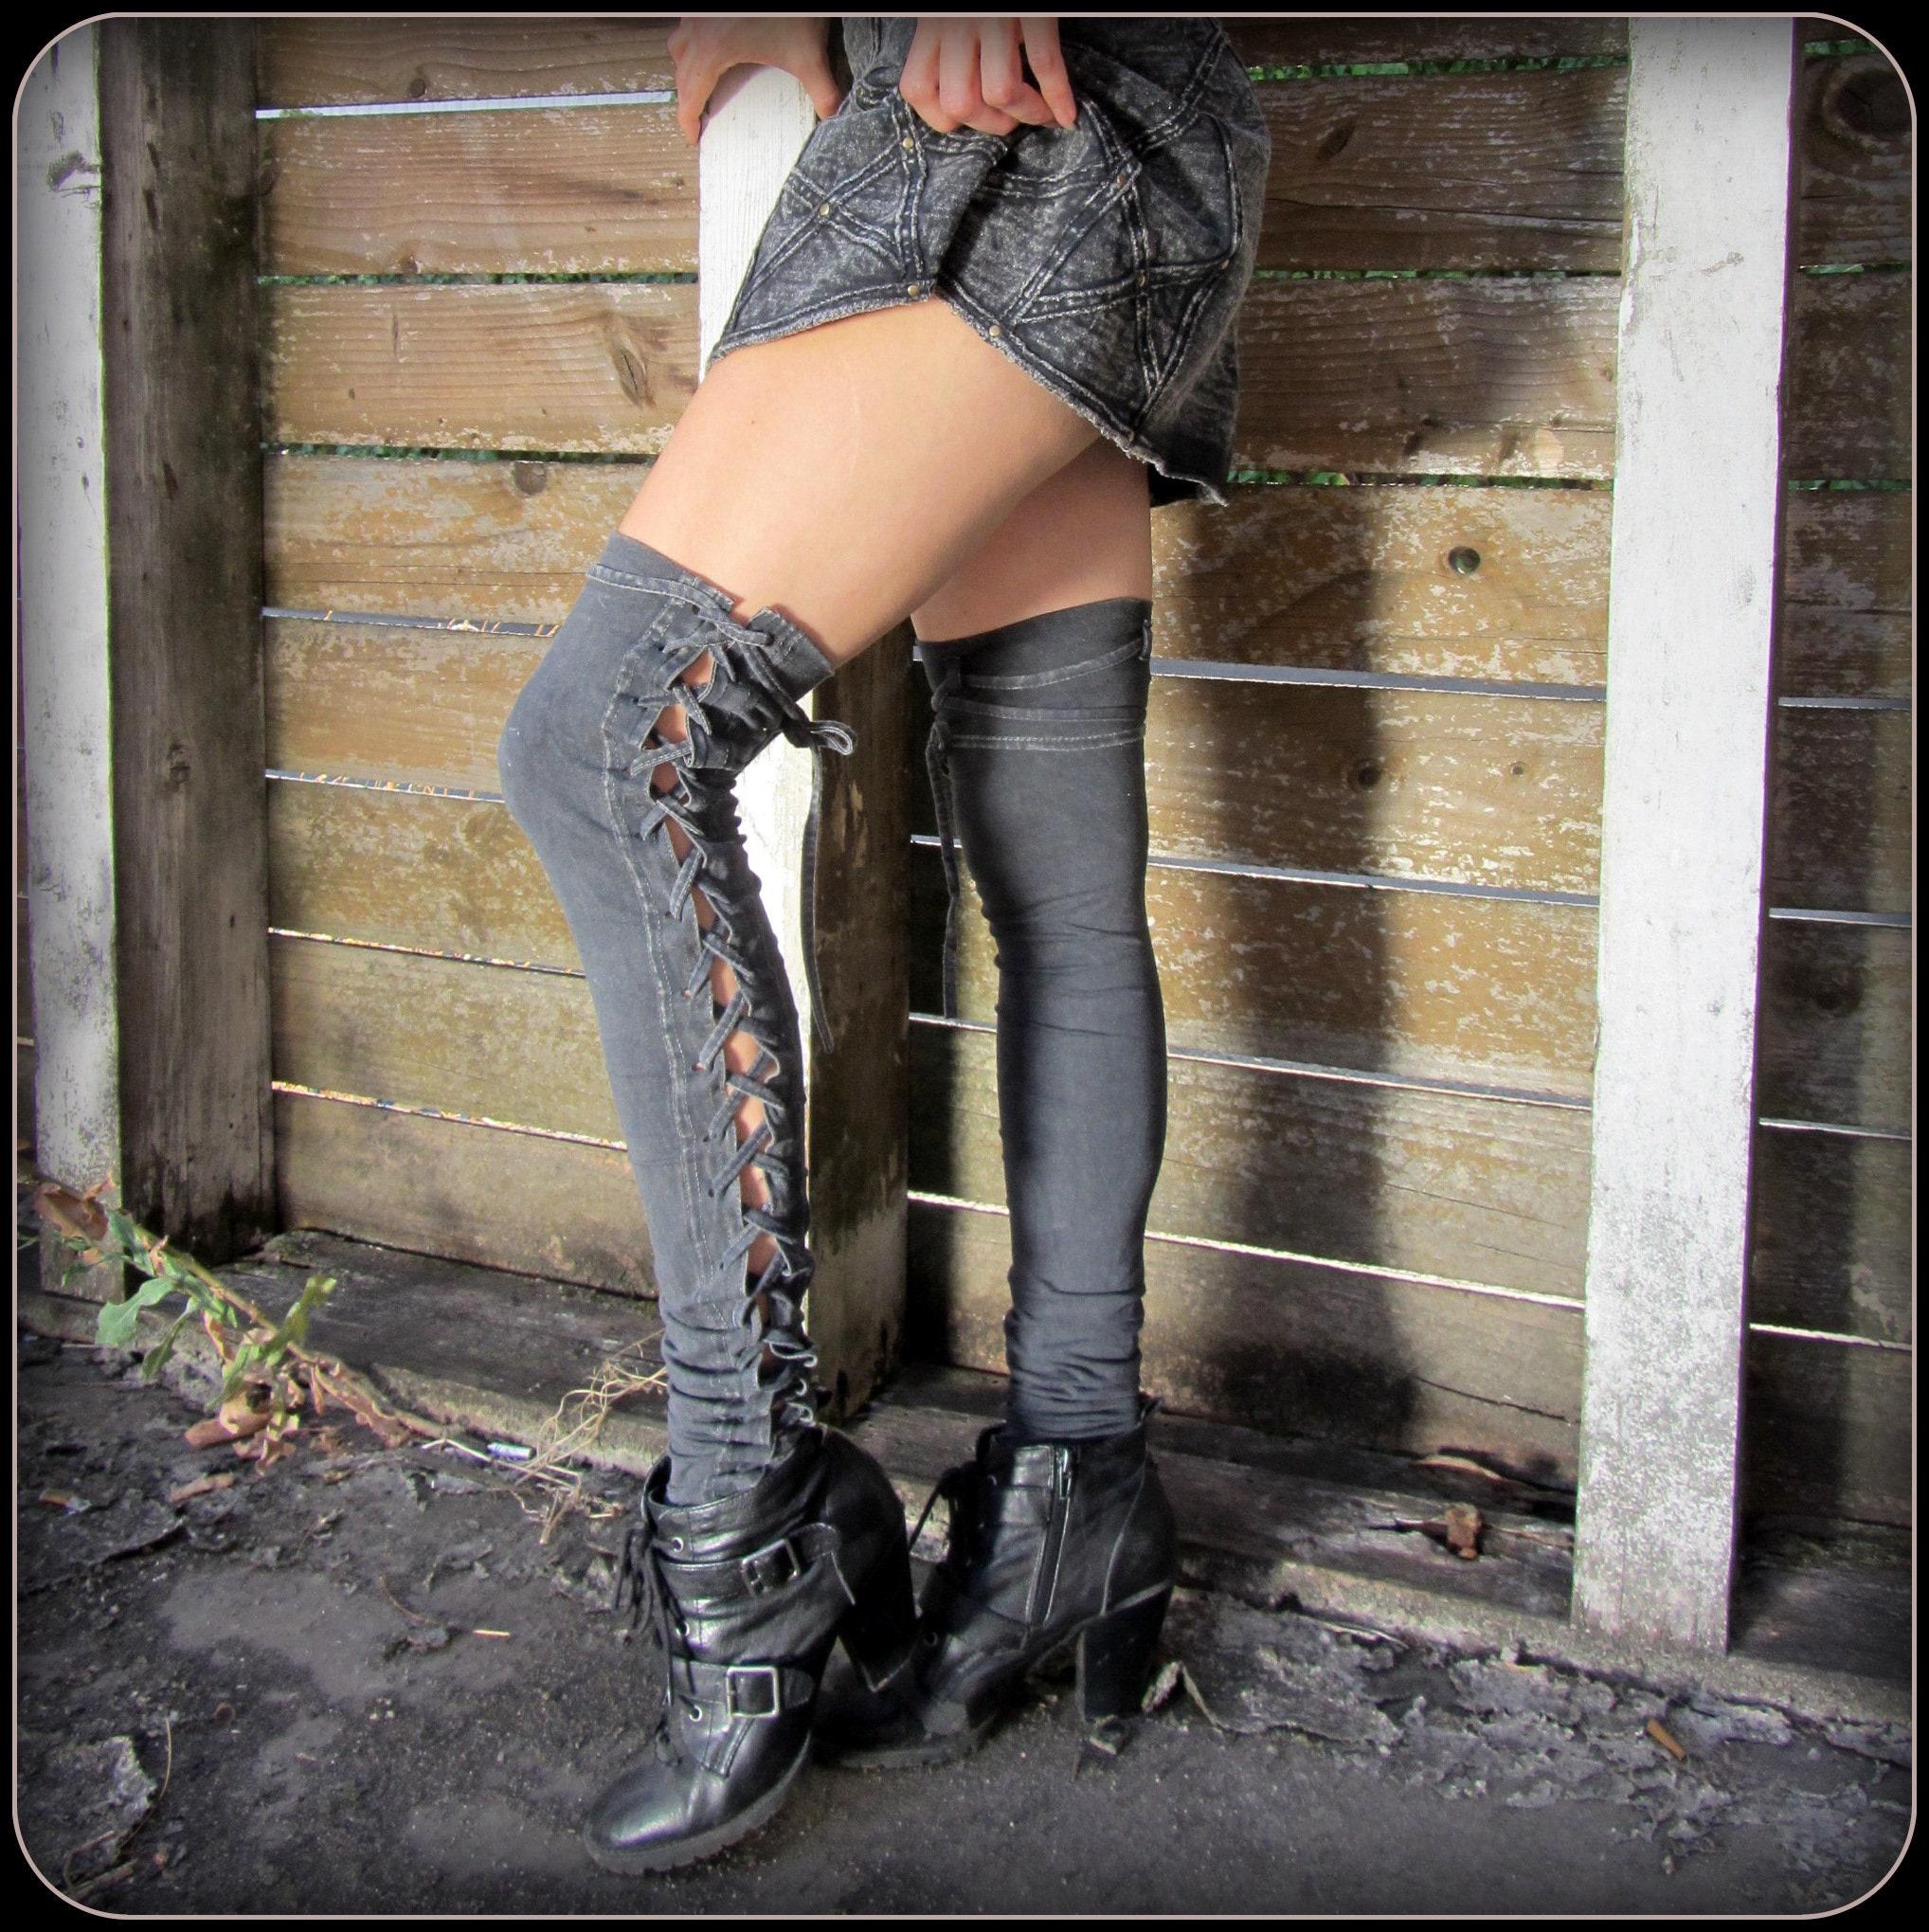 9c76eee8e202d Leg Warmers Steampunk leggings Viking thigh highs post | Etsy